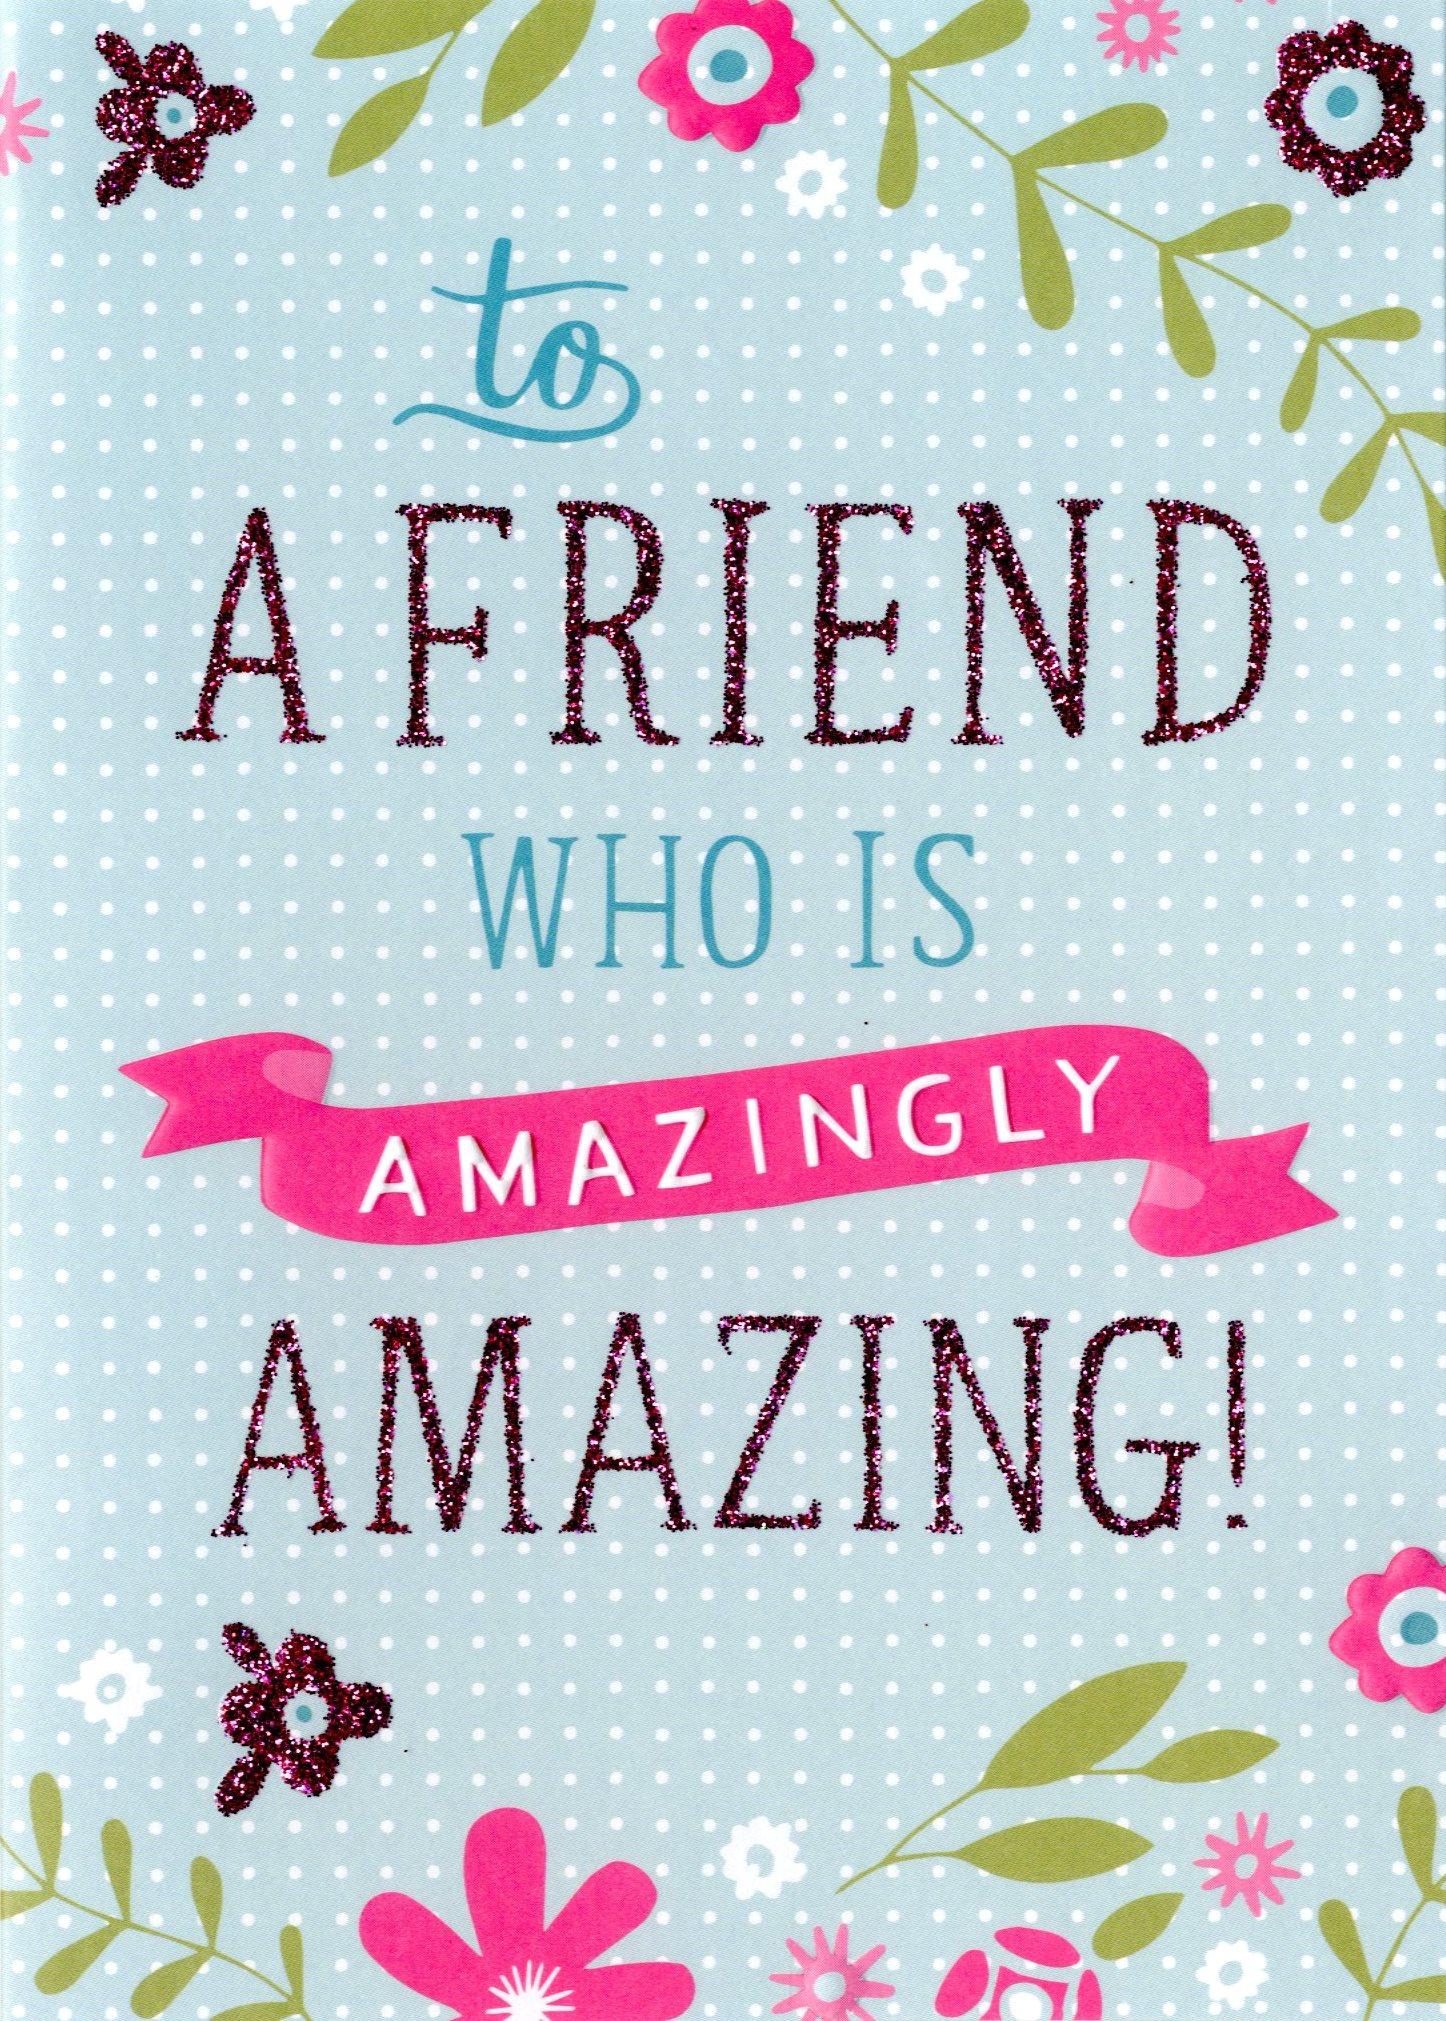 Amazingly Amazing Friend Birthday Card   Cards   Love Kates